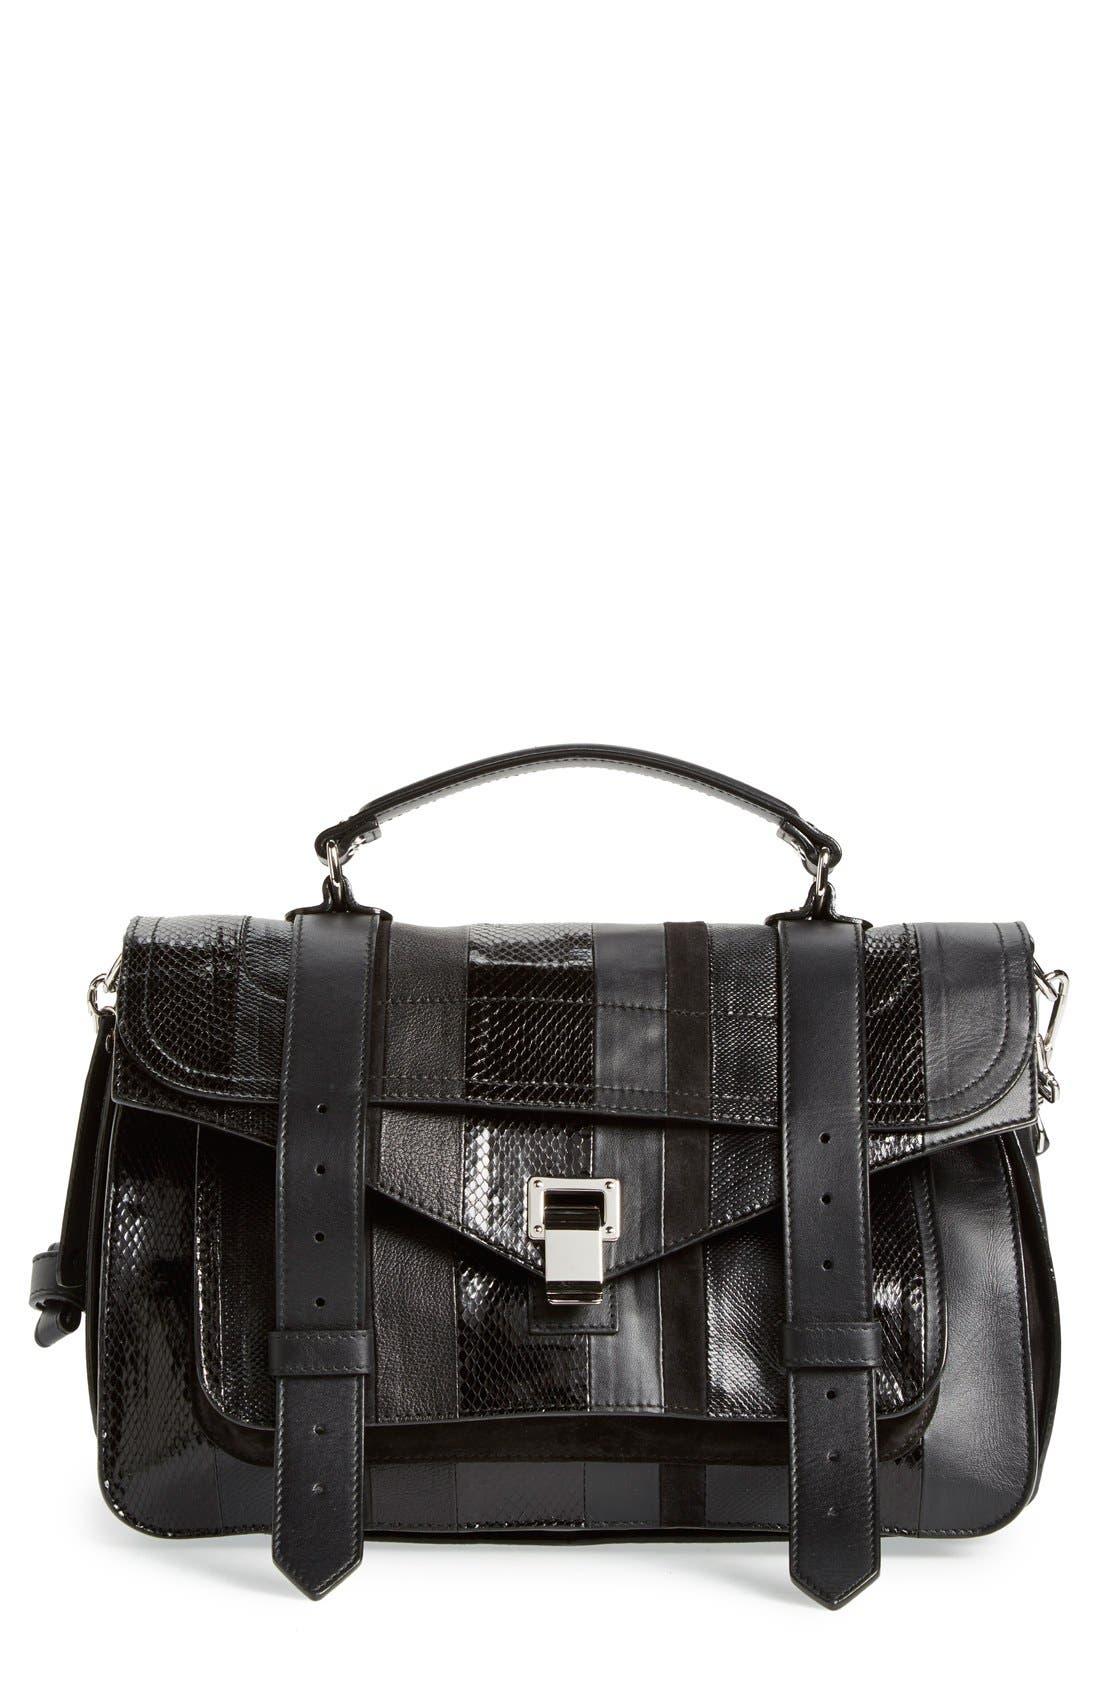 Main Image - Proenza Schouler 'Medium PS1 - Exotic Stripe' Genuine Snakeskin & Leather Satchel